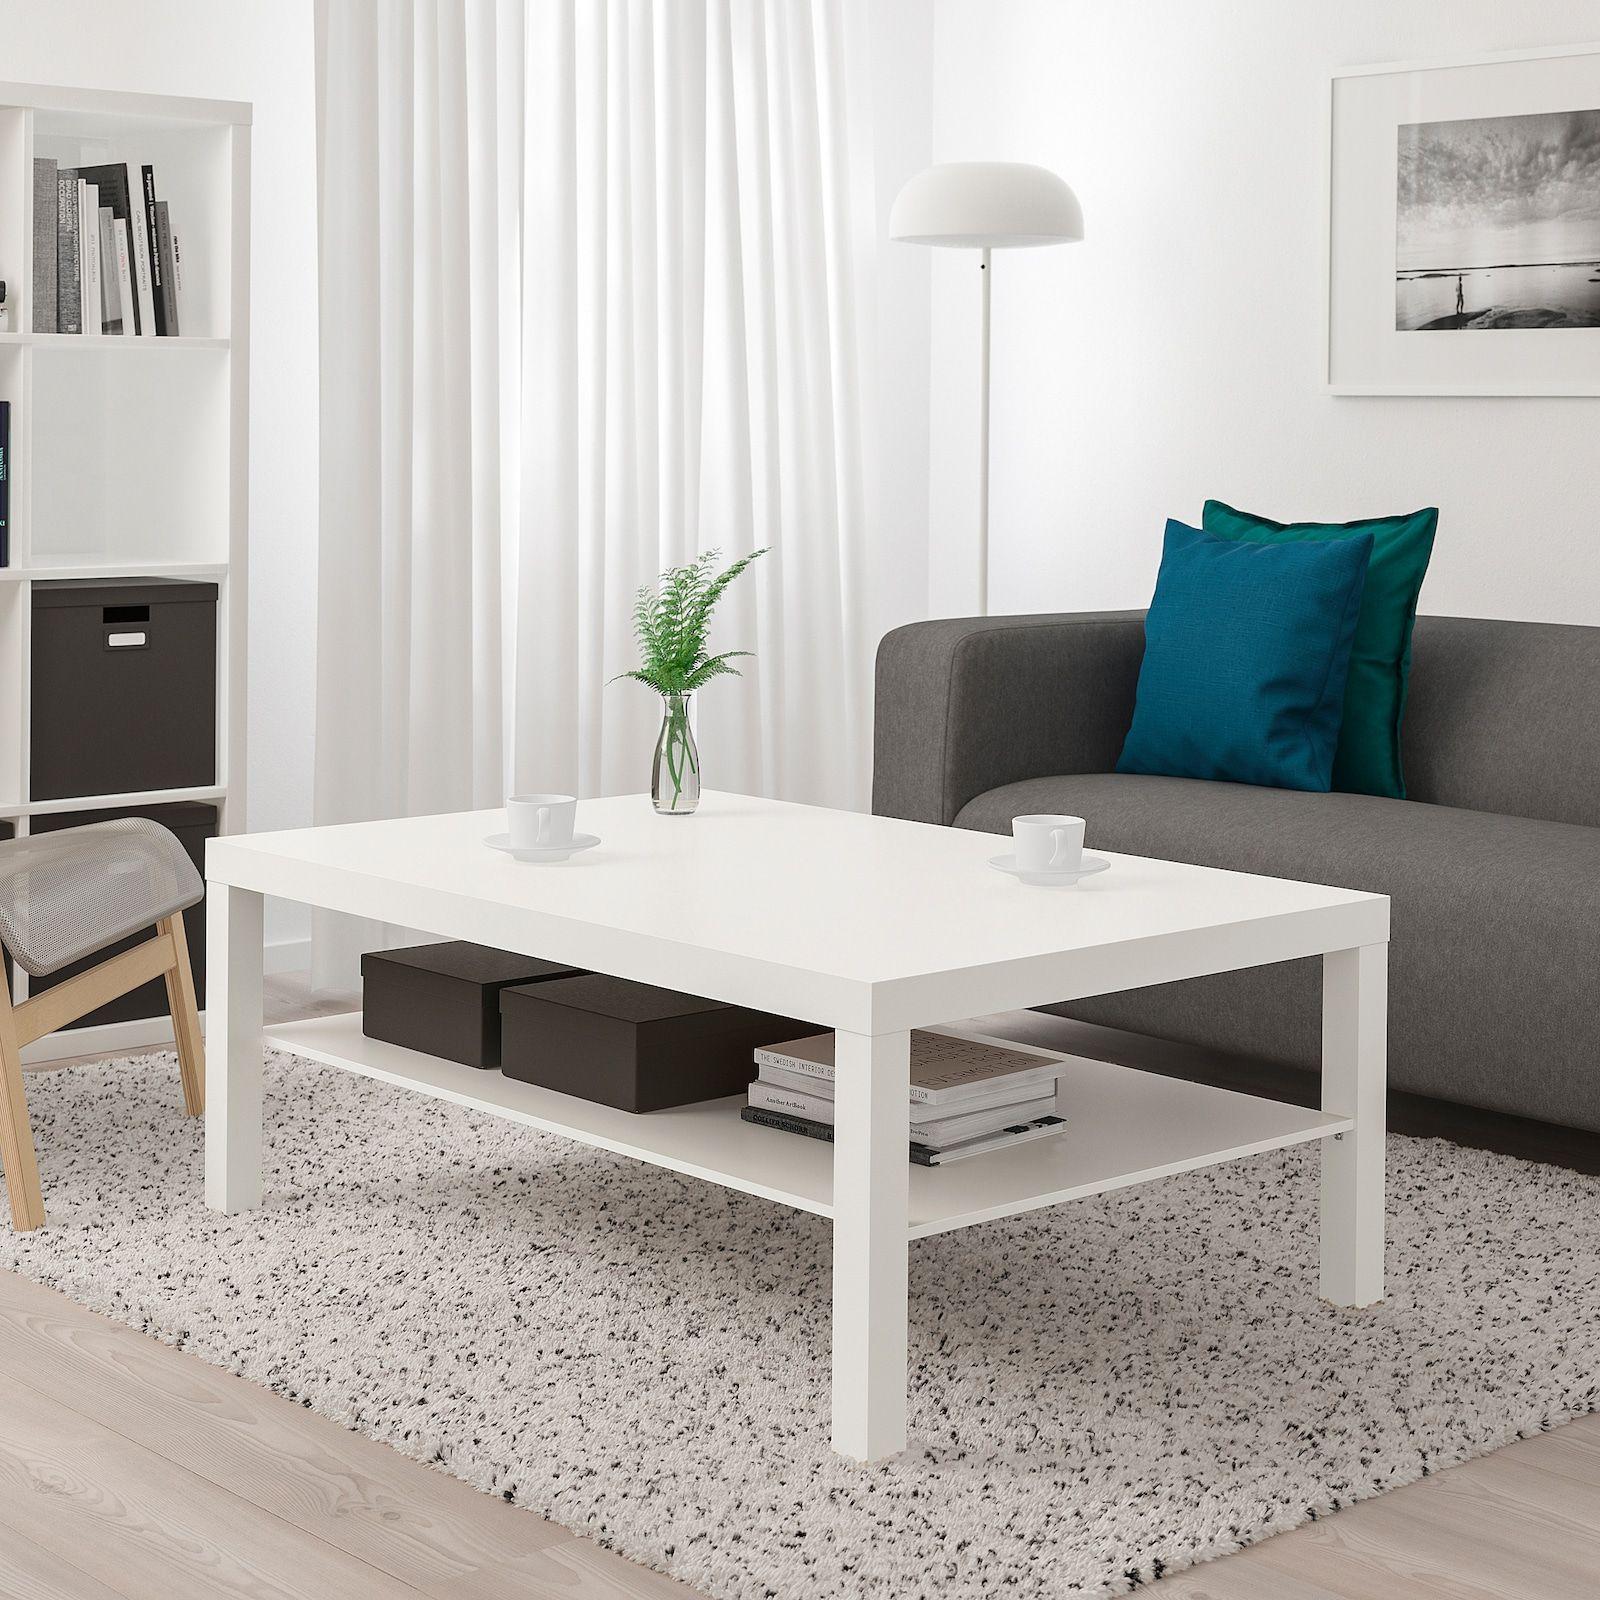 Lack Coffee Table White 46 1 2x30 3 4 Ikea In 2021 White Coffee Table Living Room Lack Coffee Table Ikea Lack Coffee Table [ 1600 x 1600 Pixel ]